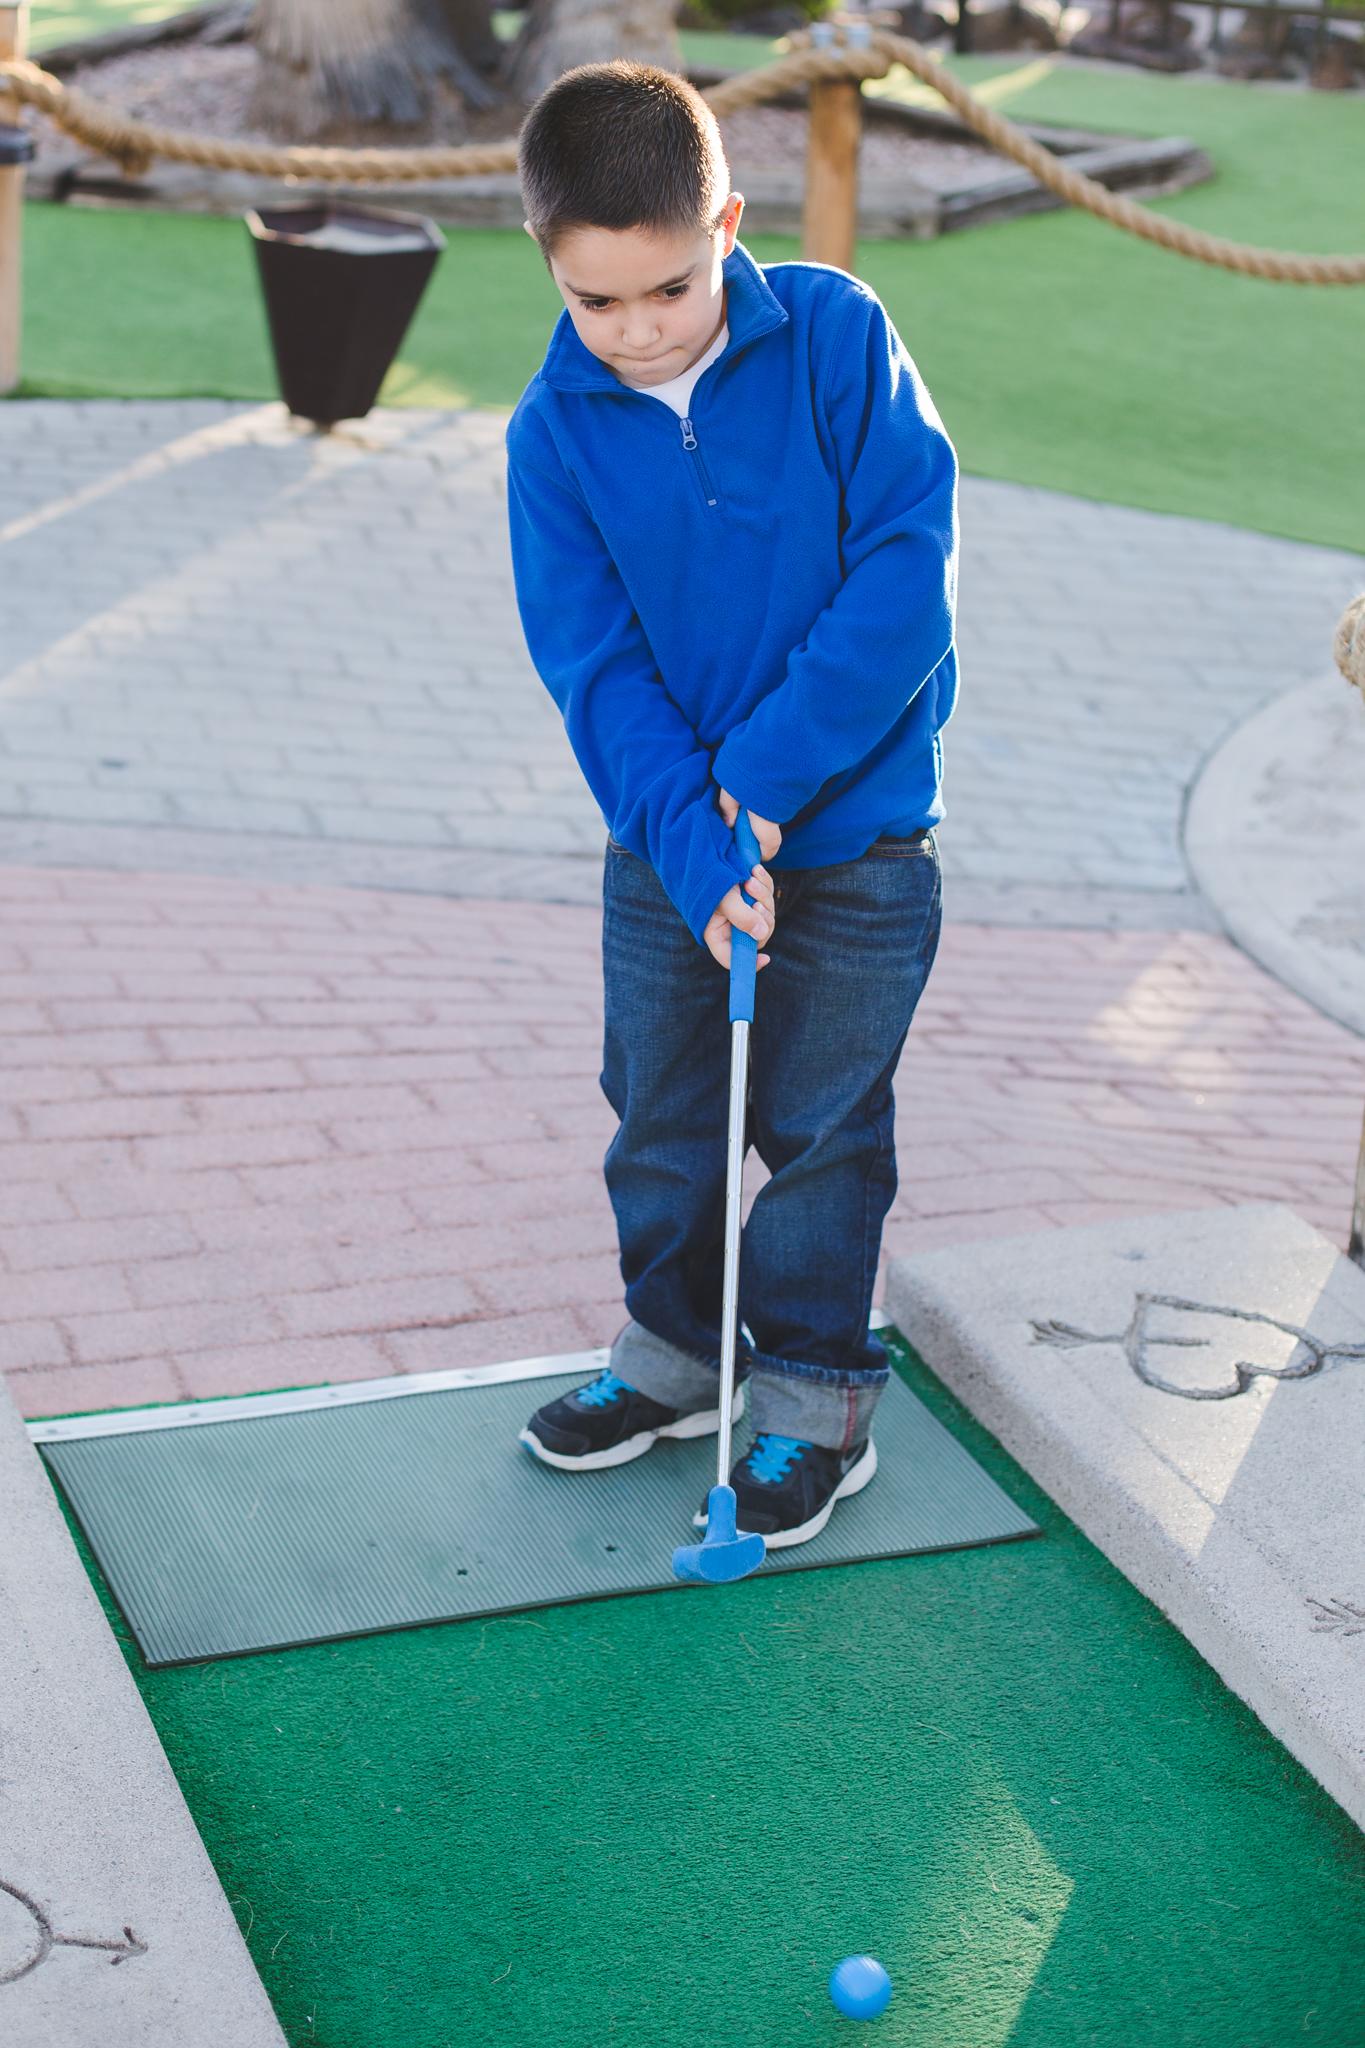 john teeing off mini golf castles n coasters